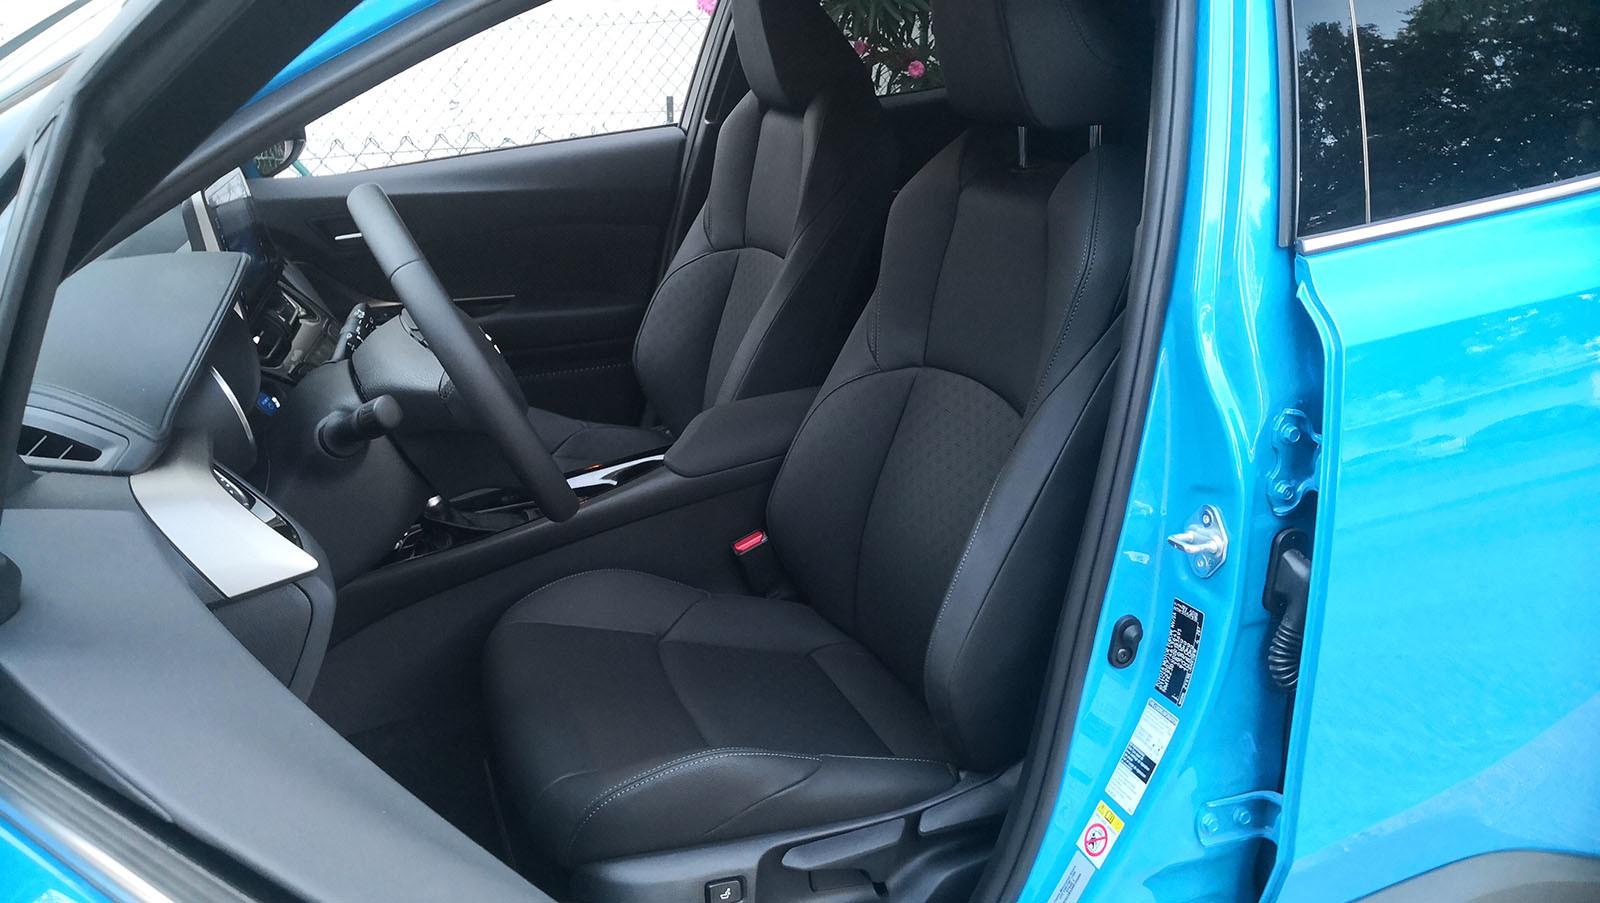 Toyota C-HR Dynamic Plus - Fotos interiores y detalles